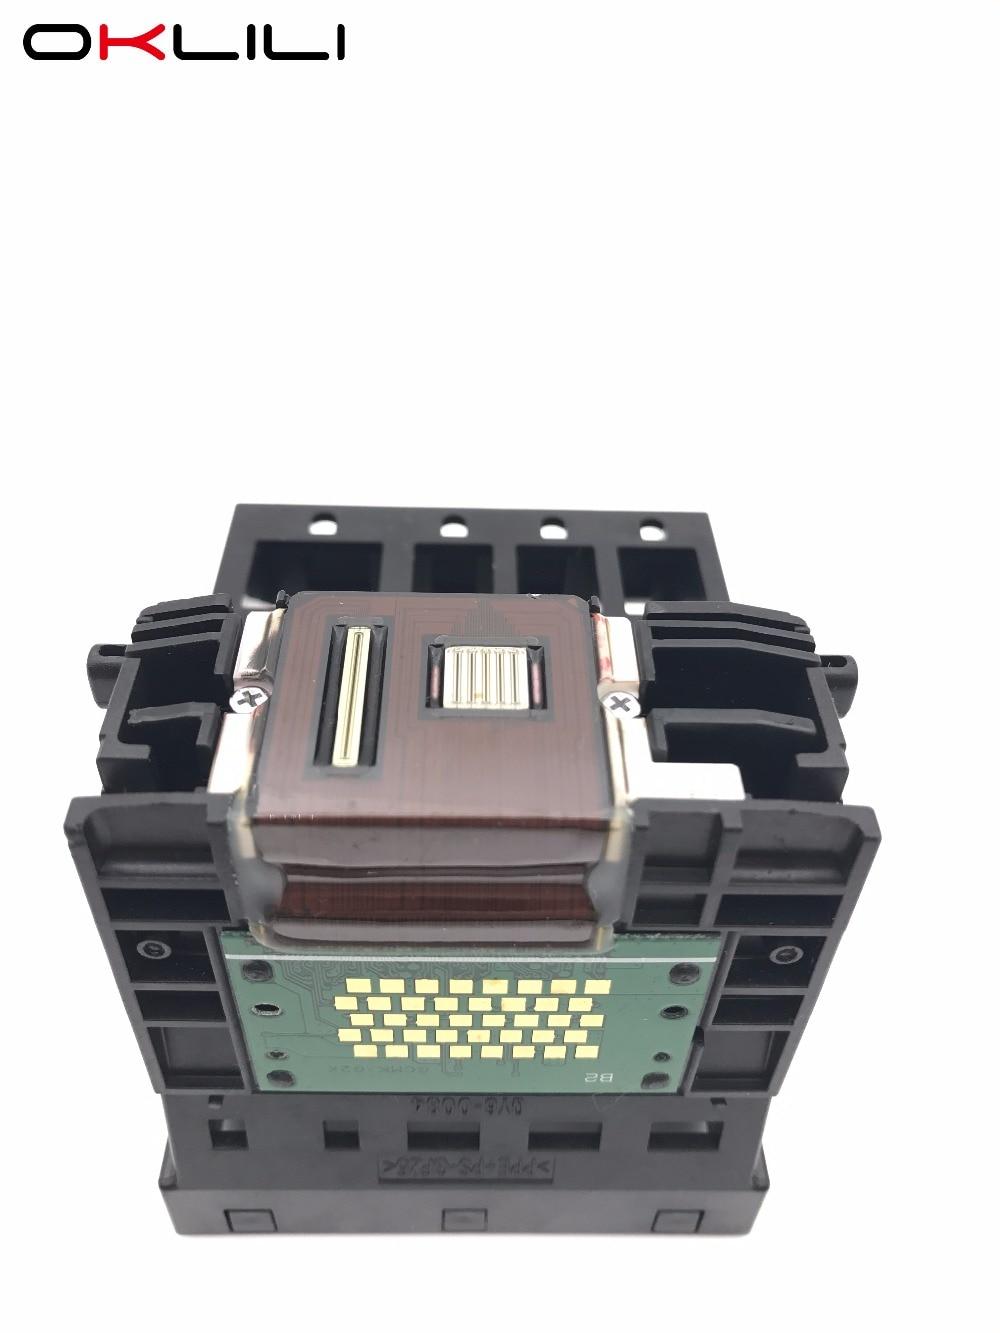 OKLILI ORIGINAL QY6-0034 Printhead Print Head for Canon S500 S520 S530D S600 S630 i6100 i6500 S6300 i650 MP F30 F50 C60 C70 oklili qy6 0080 printhead printer print head for canon ip4820 ip4850 ix6520 ix6550 mx715 mx885 mg5220 mg5250 mg5320 mg5350